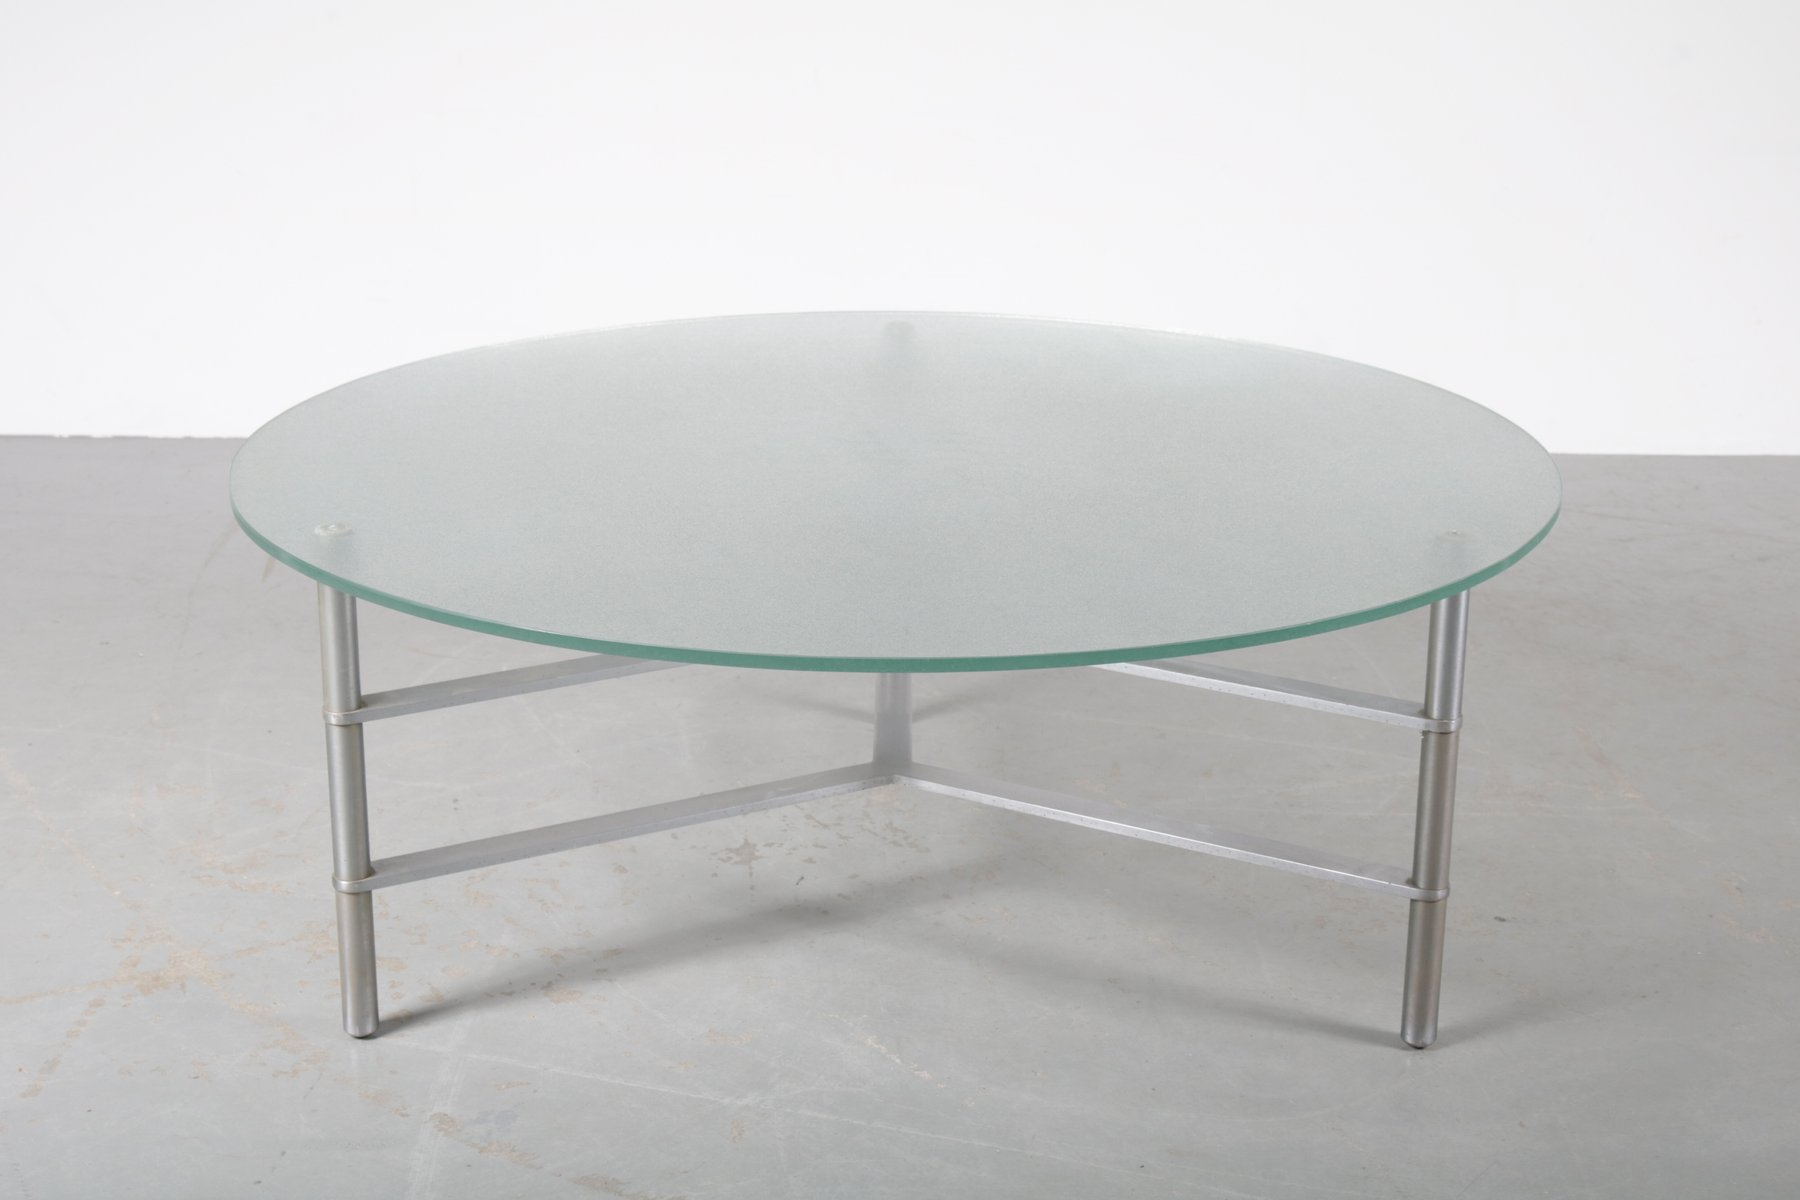 table basse ronde en verre 1960s en vente sur pamono. Black Bedroom Furniture Sets. Home Design Ideas